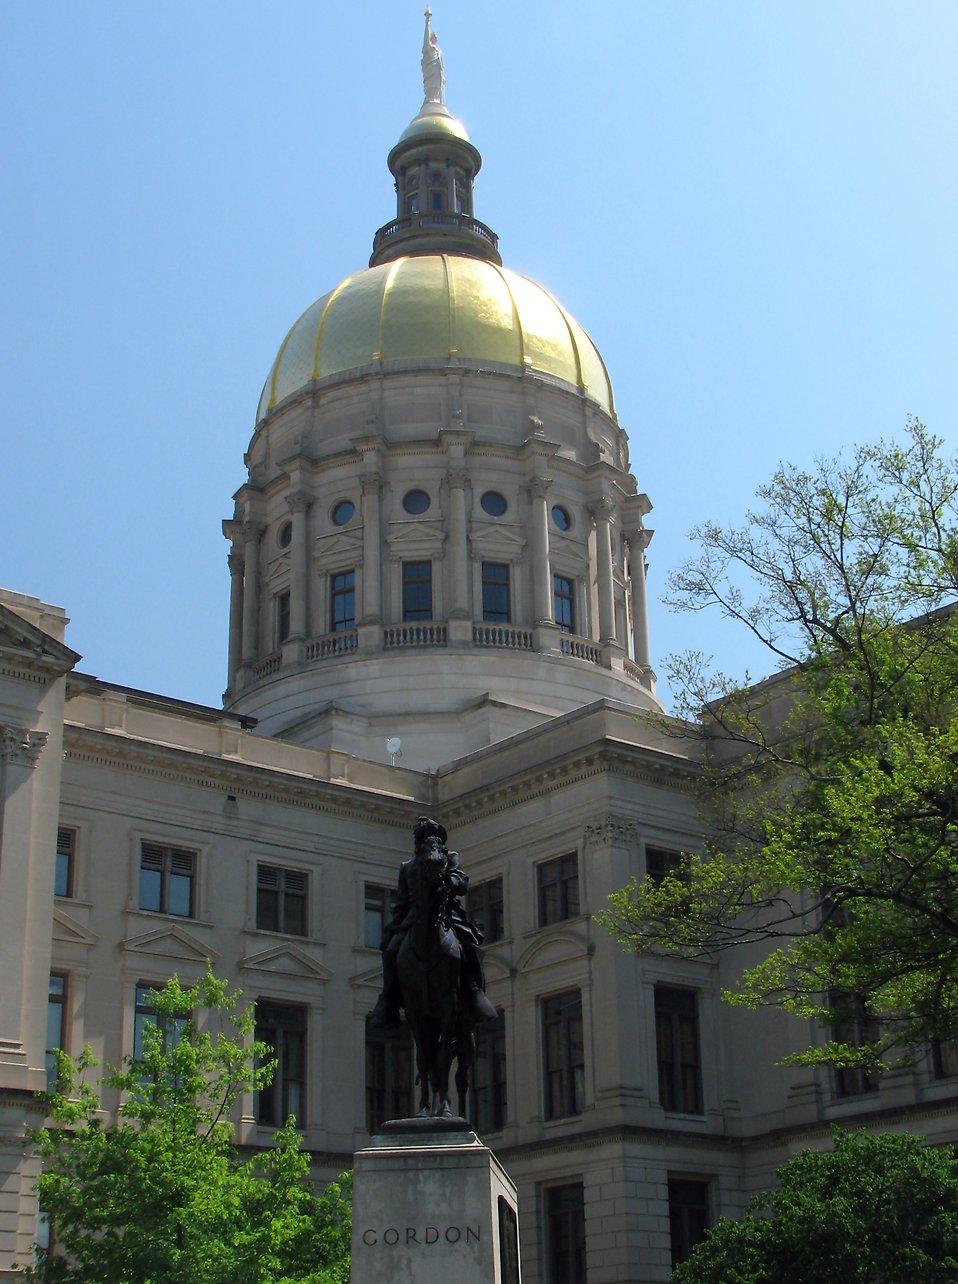 The Georgia State Capitol building in Atlanta, Georgia : Free Stock Photo